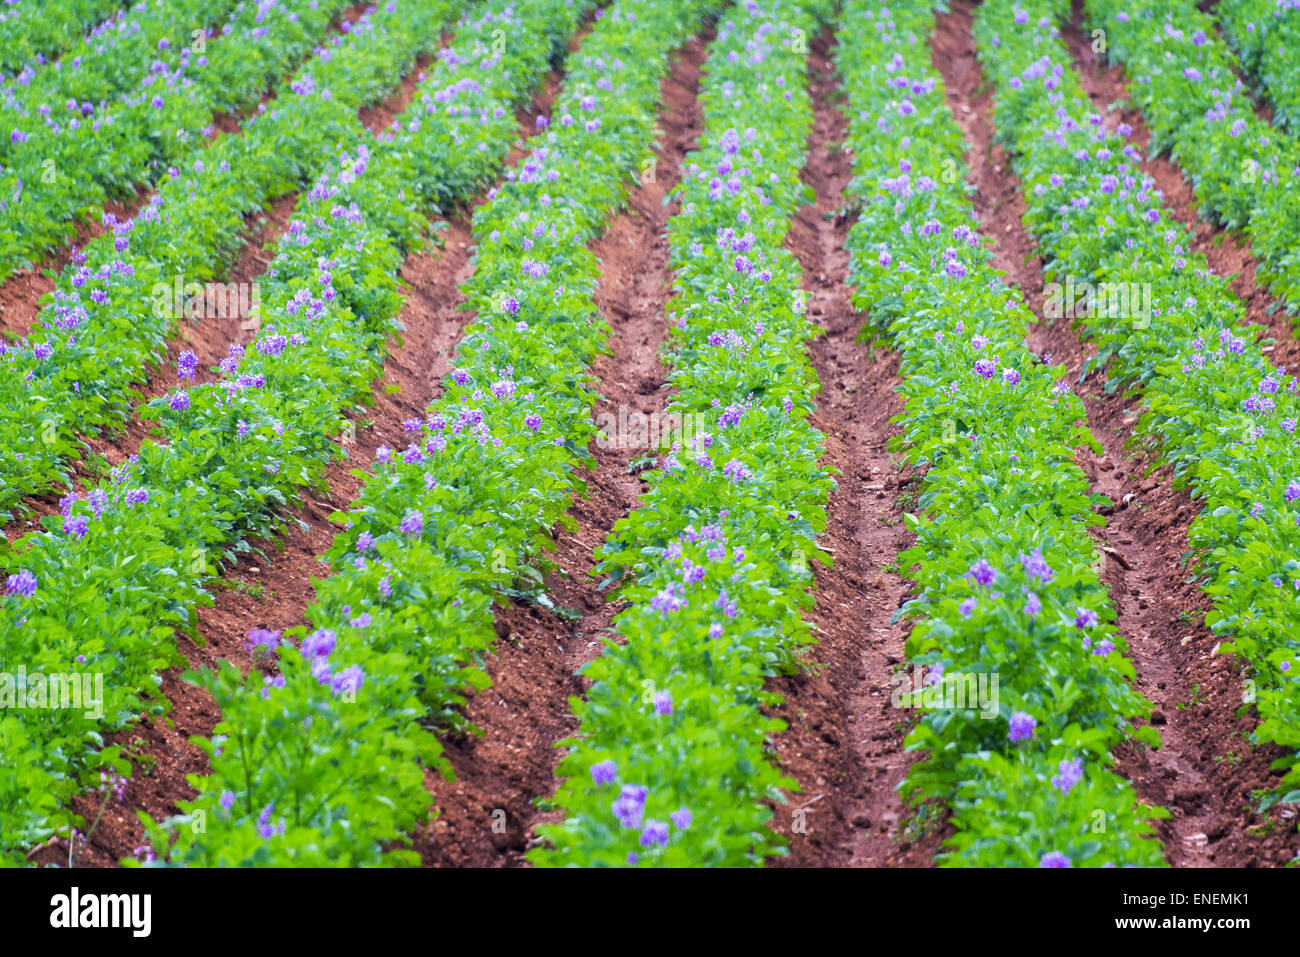 Rows of lush green potato plants with purple flowers near Concepcion, Peru - Stock Image